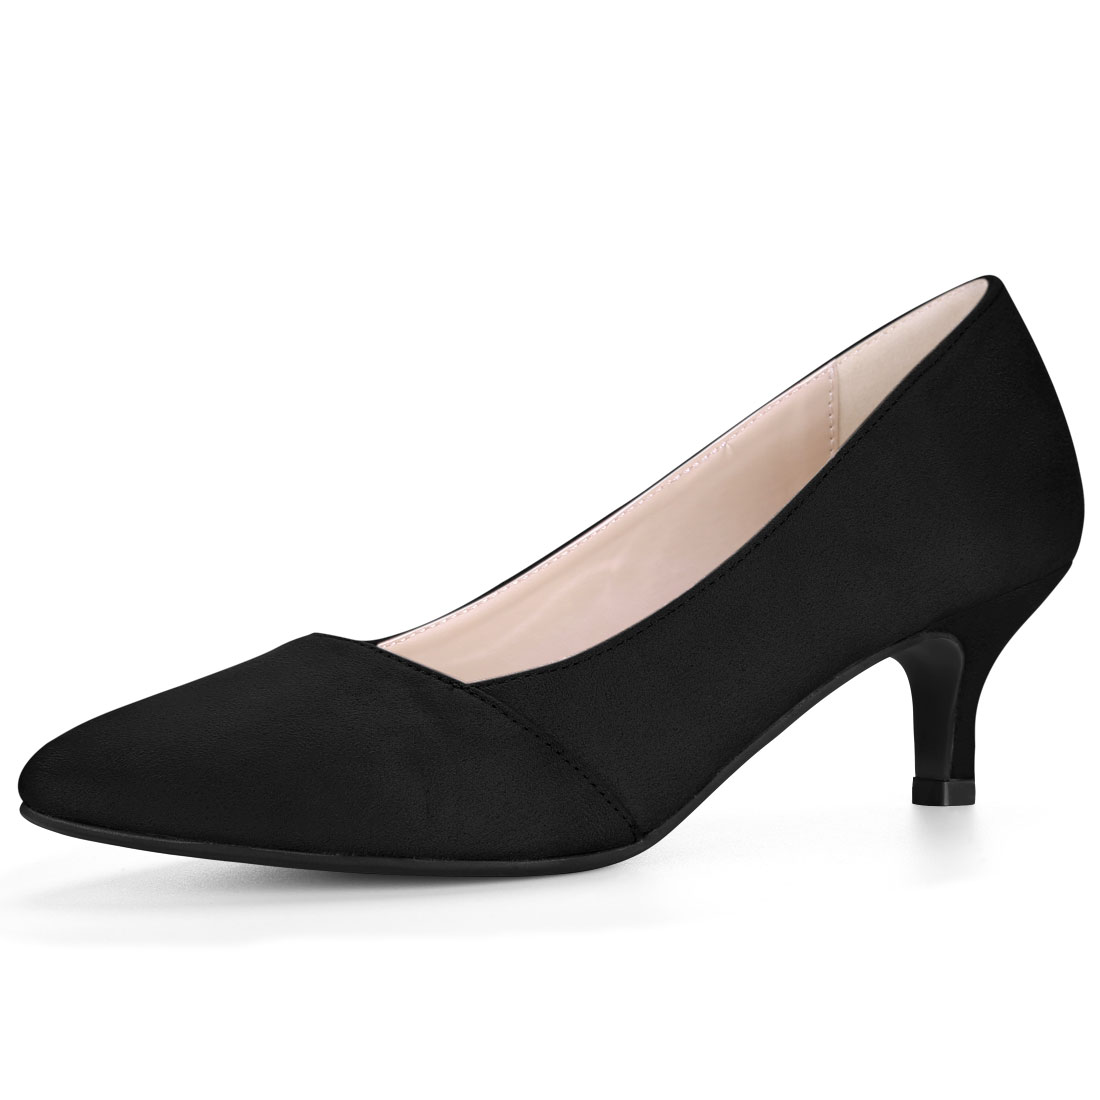 Women Pointed Toe Mid Stiletto Heel Pumps Black US 6